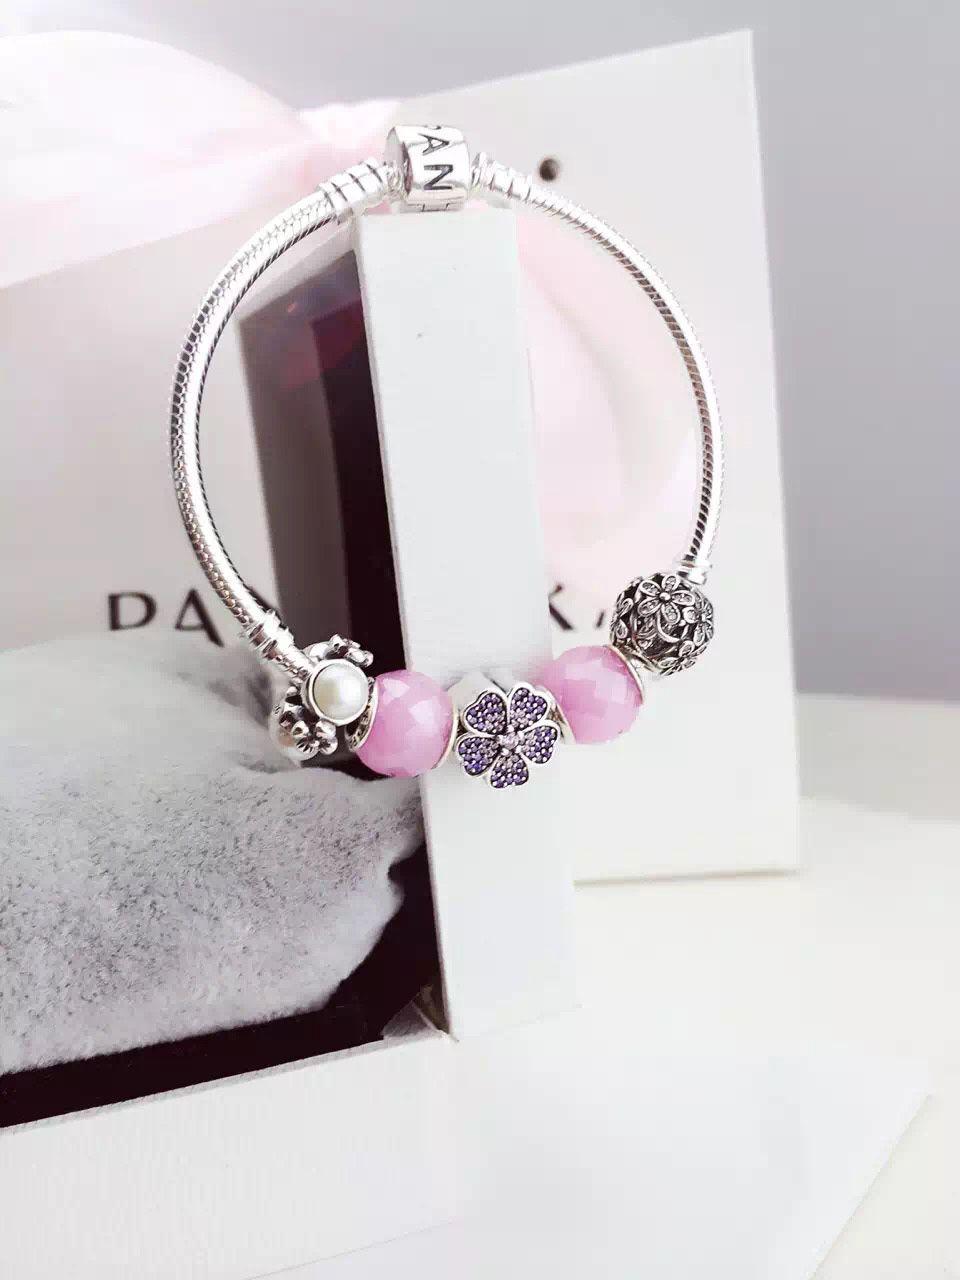 50% OFF!!! $159 Pandora Charm Bracelet Pink White. Hot Sale!!! SKU: CB01785 - PANDORA Bracelet Ideas